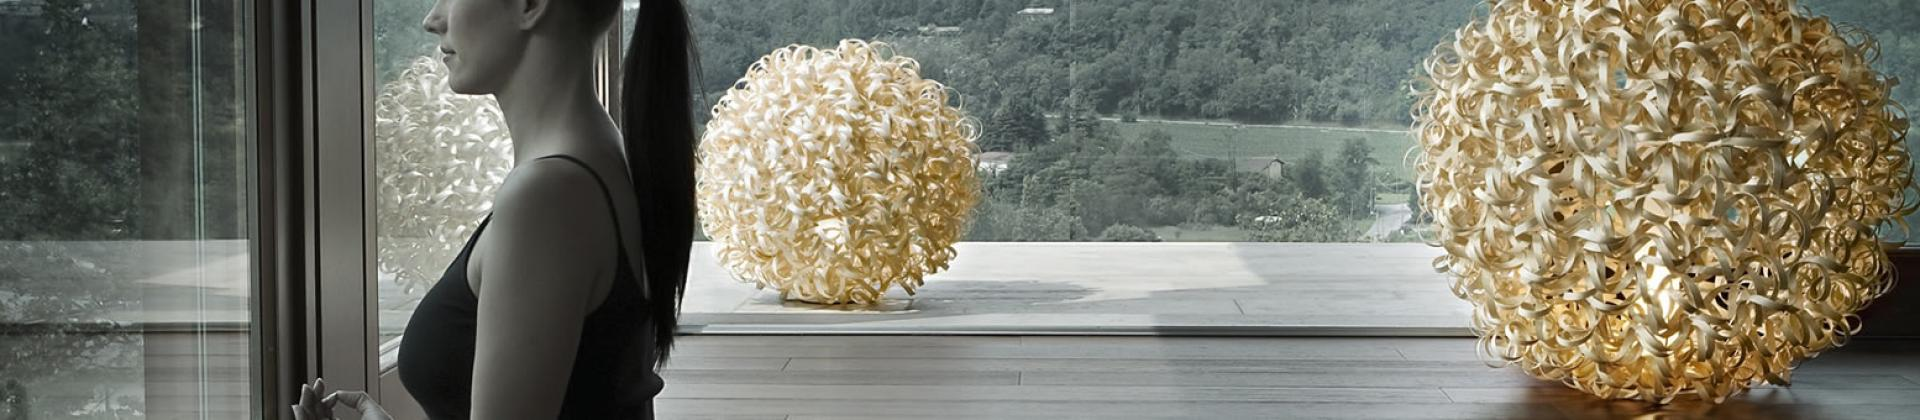 Bouquet Icone Minitallux - Lámparas de diseño